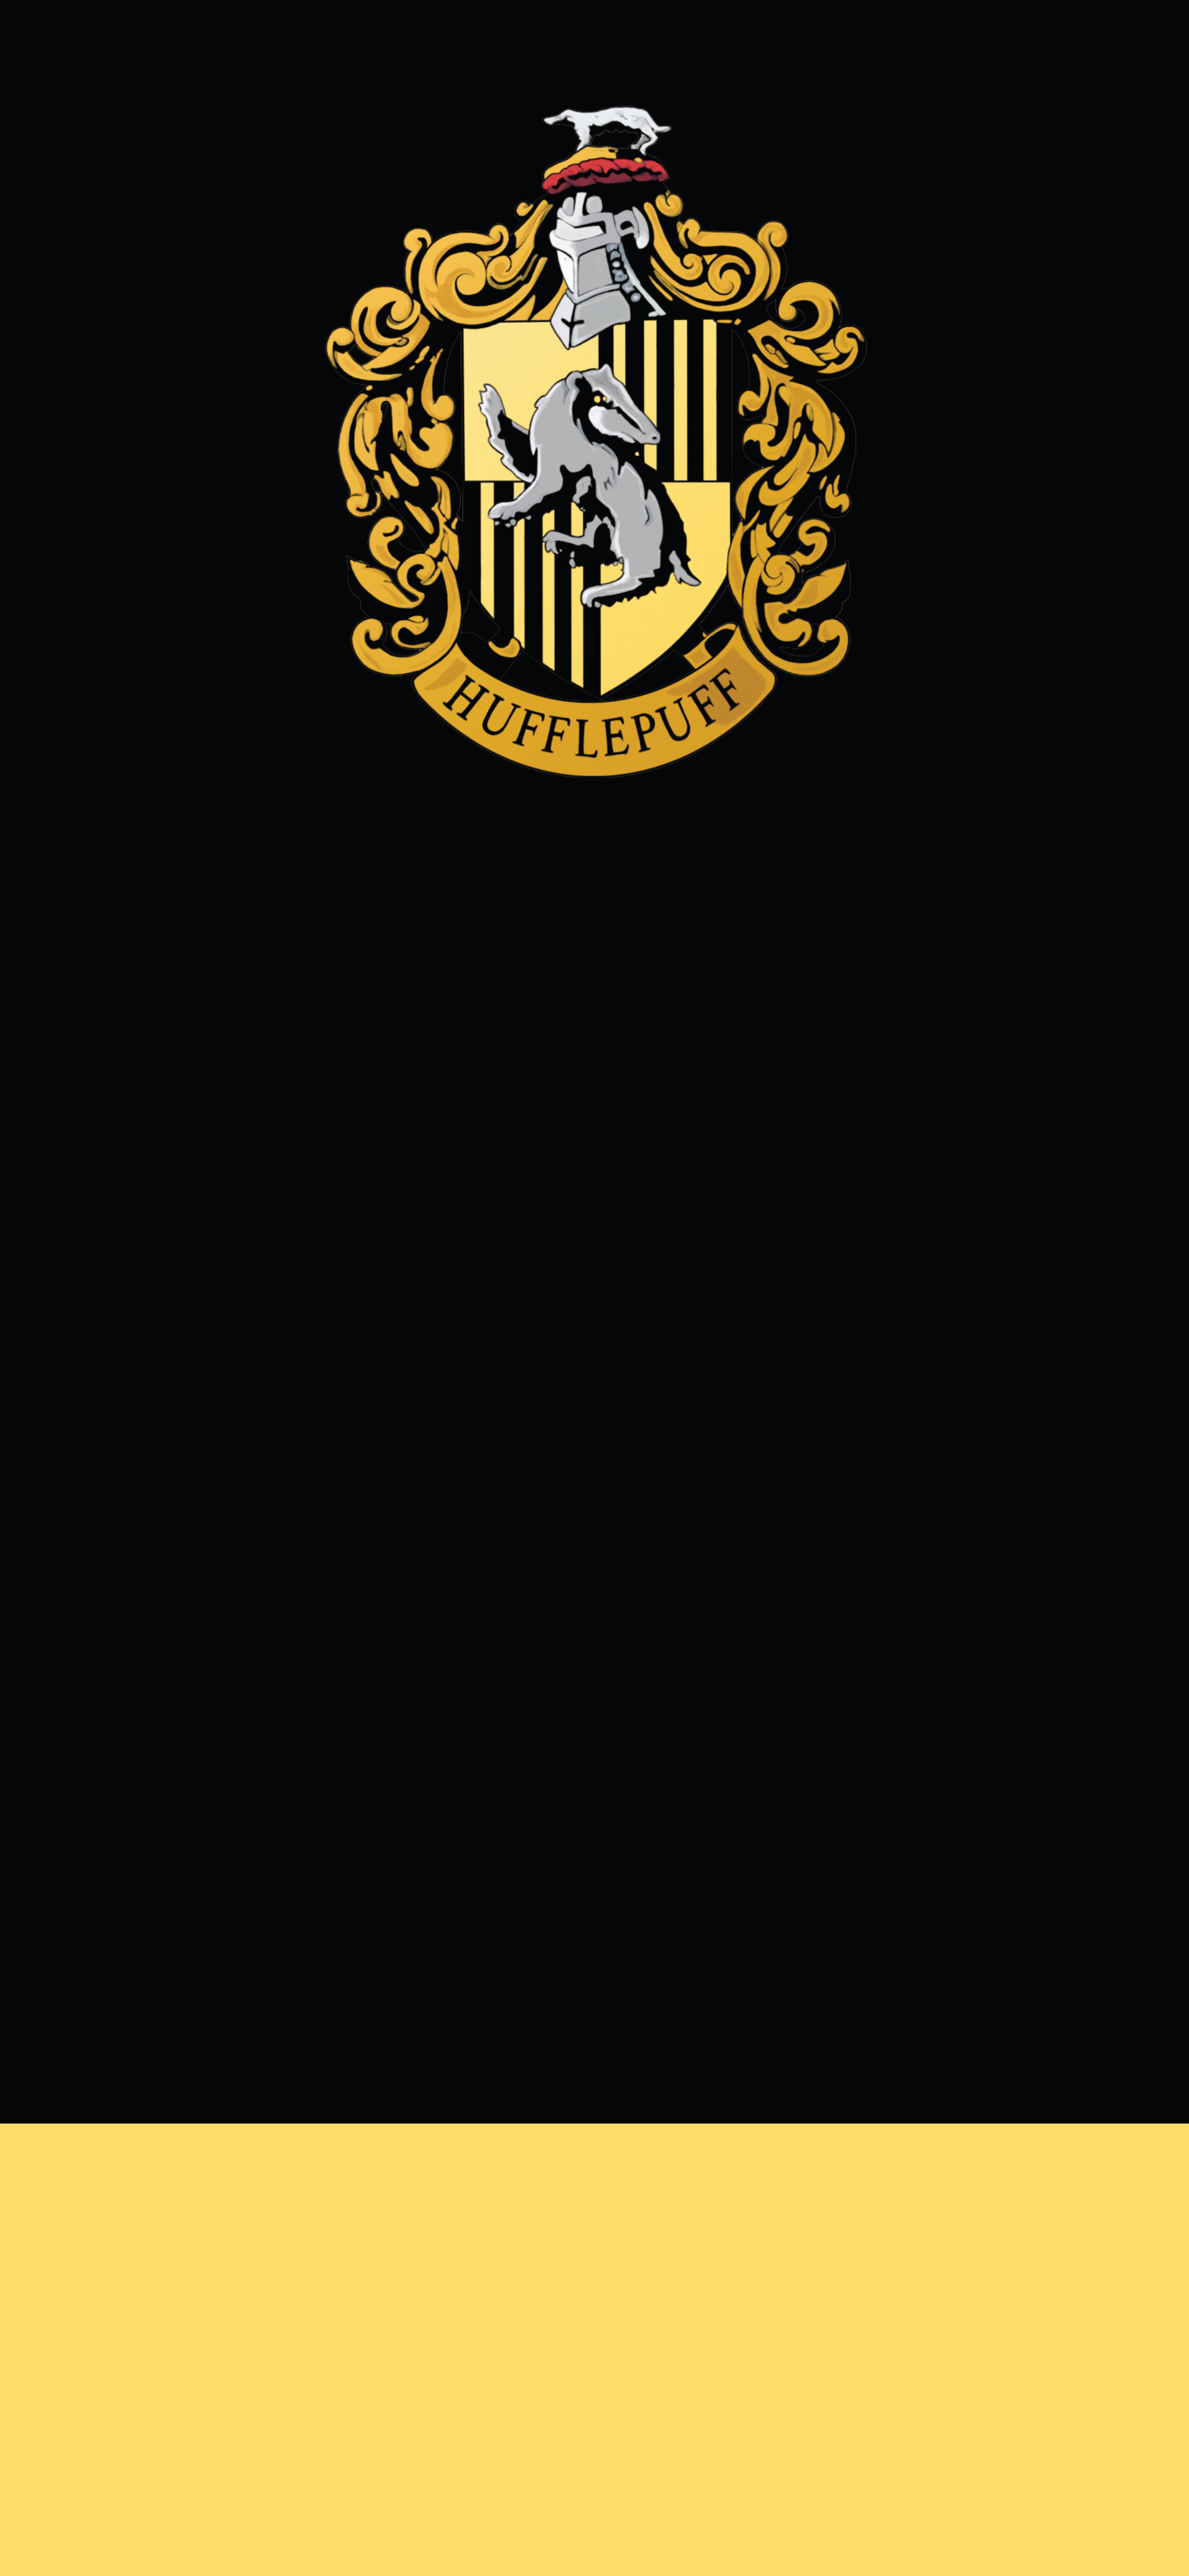 Wallpaper Harry Potter Minimalism Black Yellow 4500x9750 Yudhamanika 1740501 Hd Wallpapers Wallhere